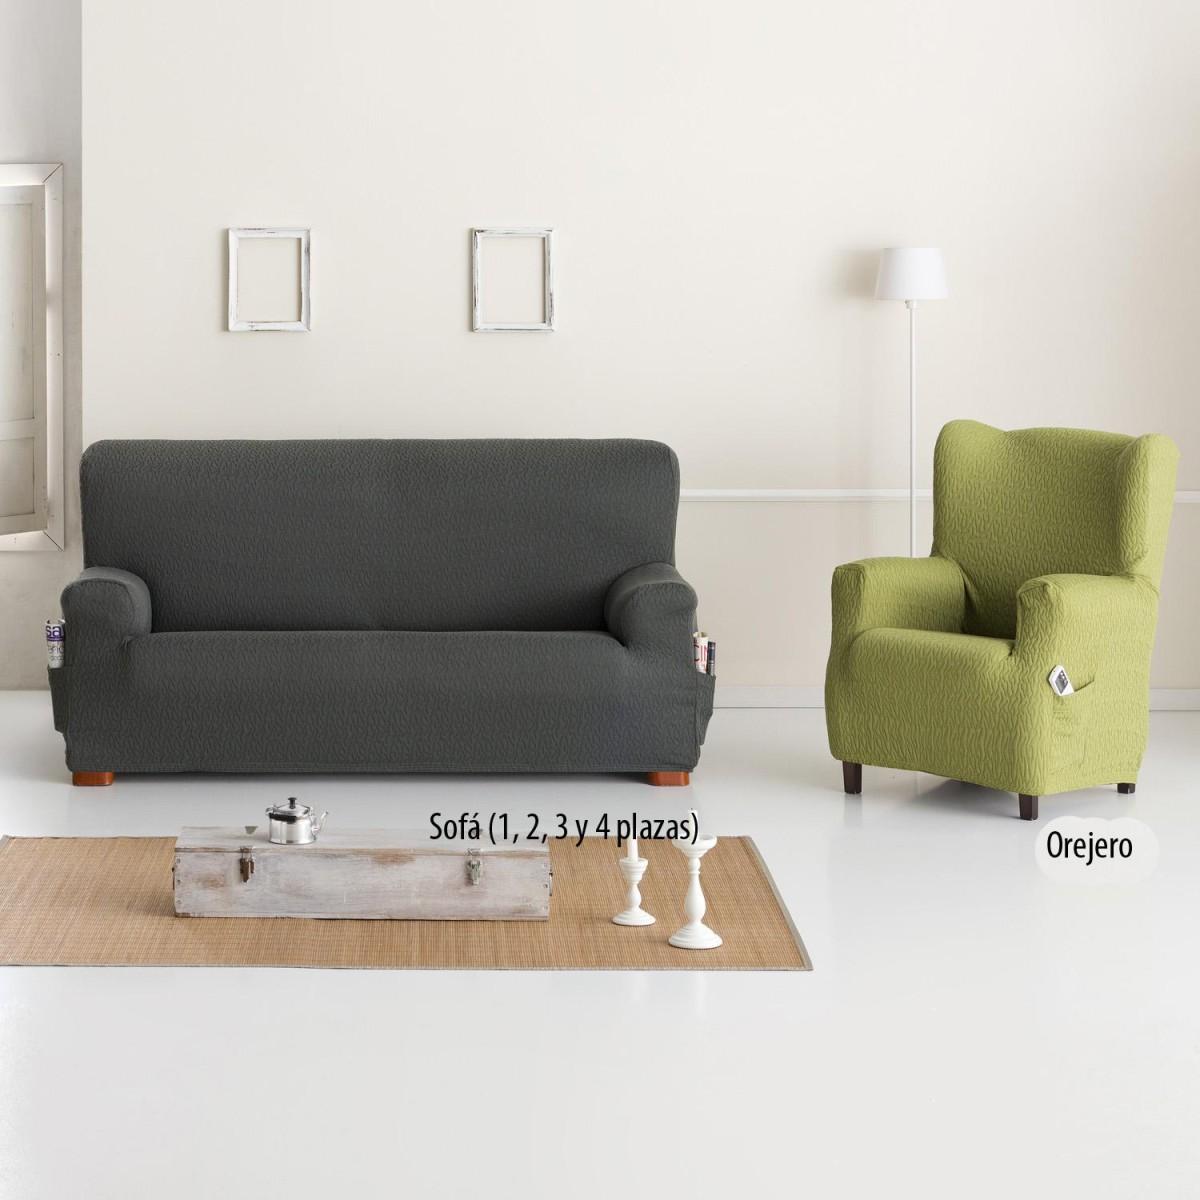 fundas para sofa en peru wooden sofas funda sofá tendre eysa